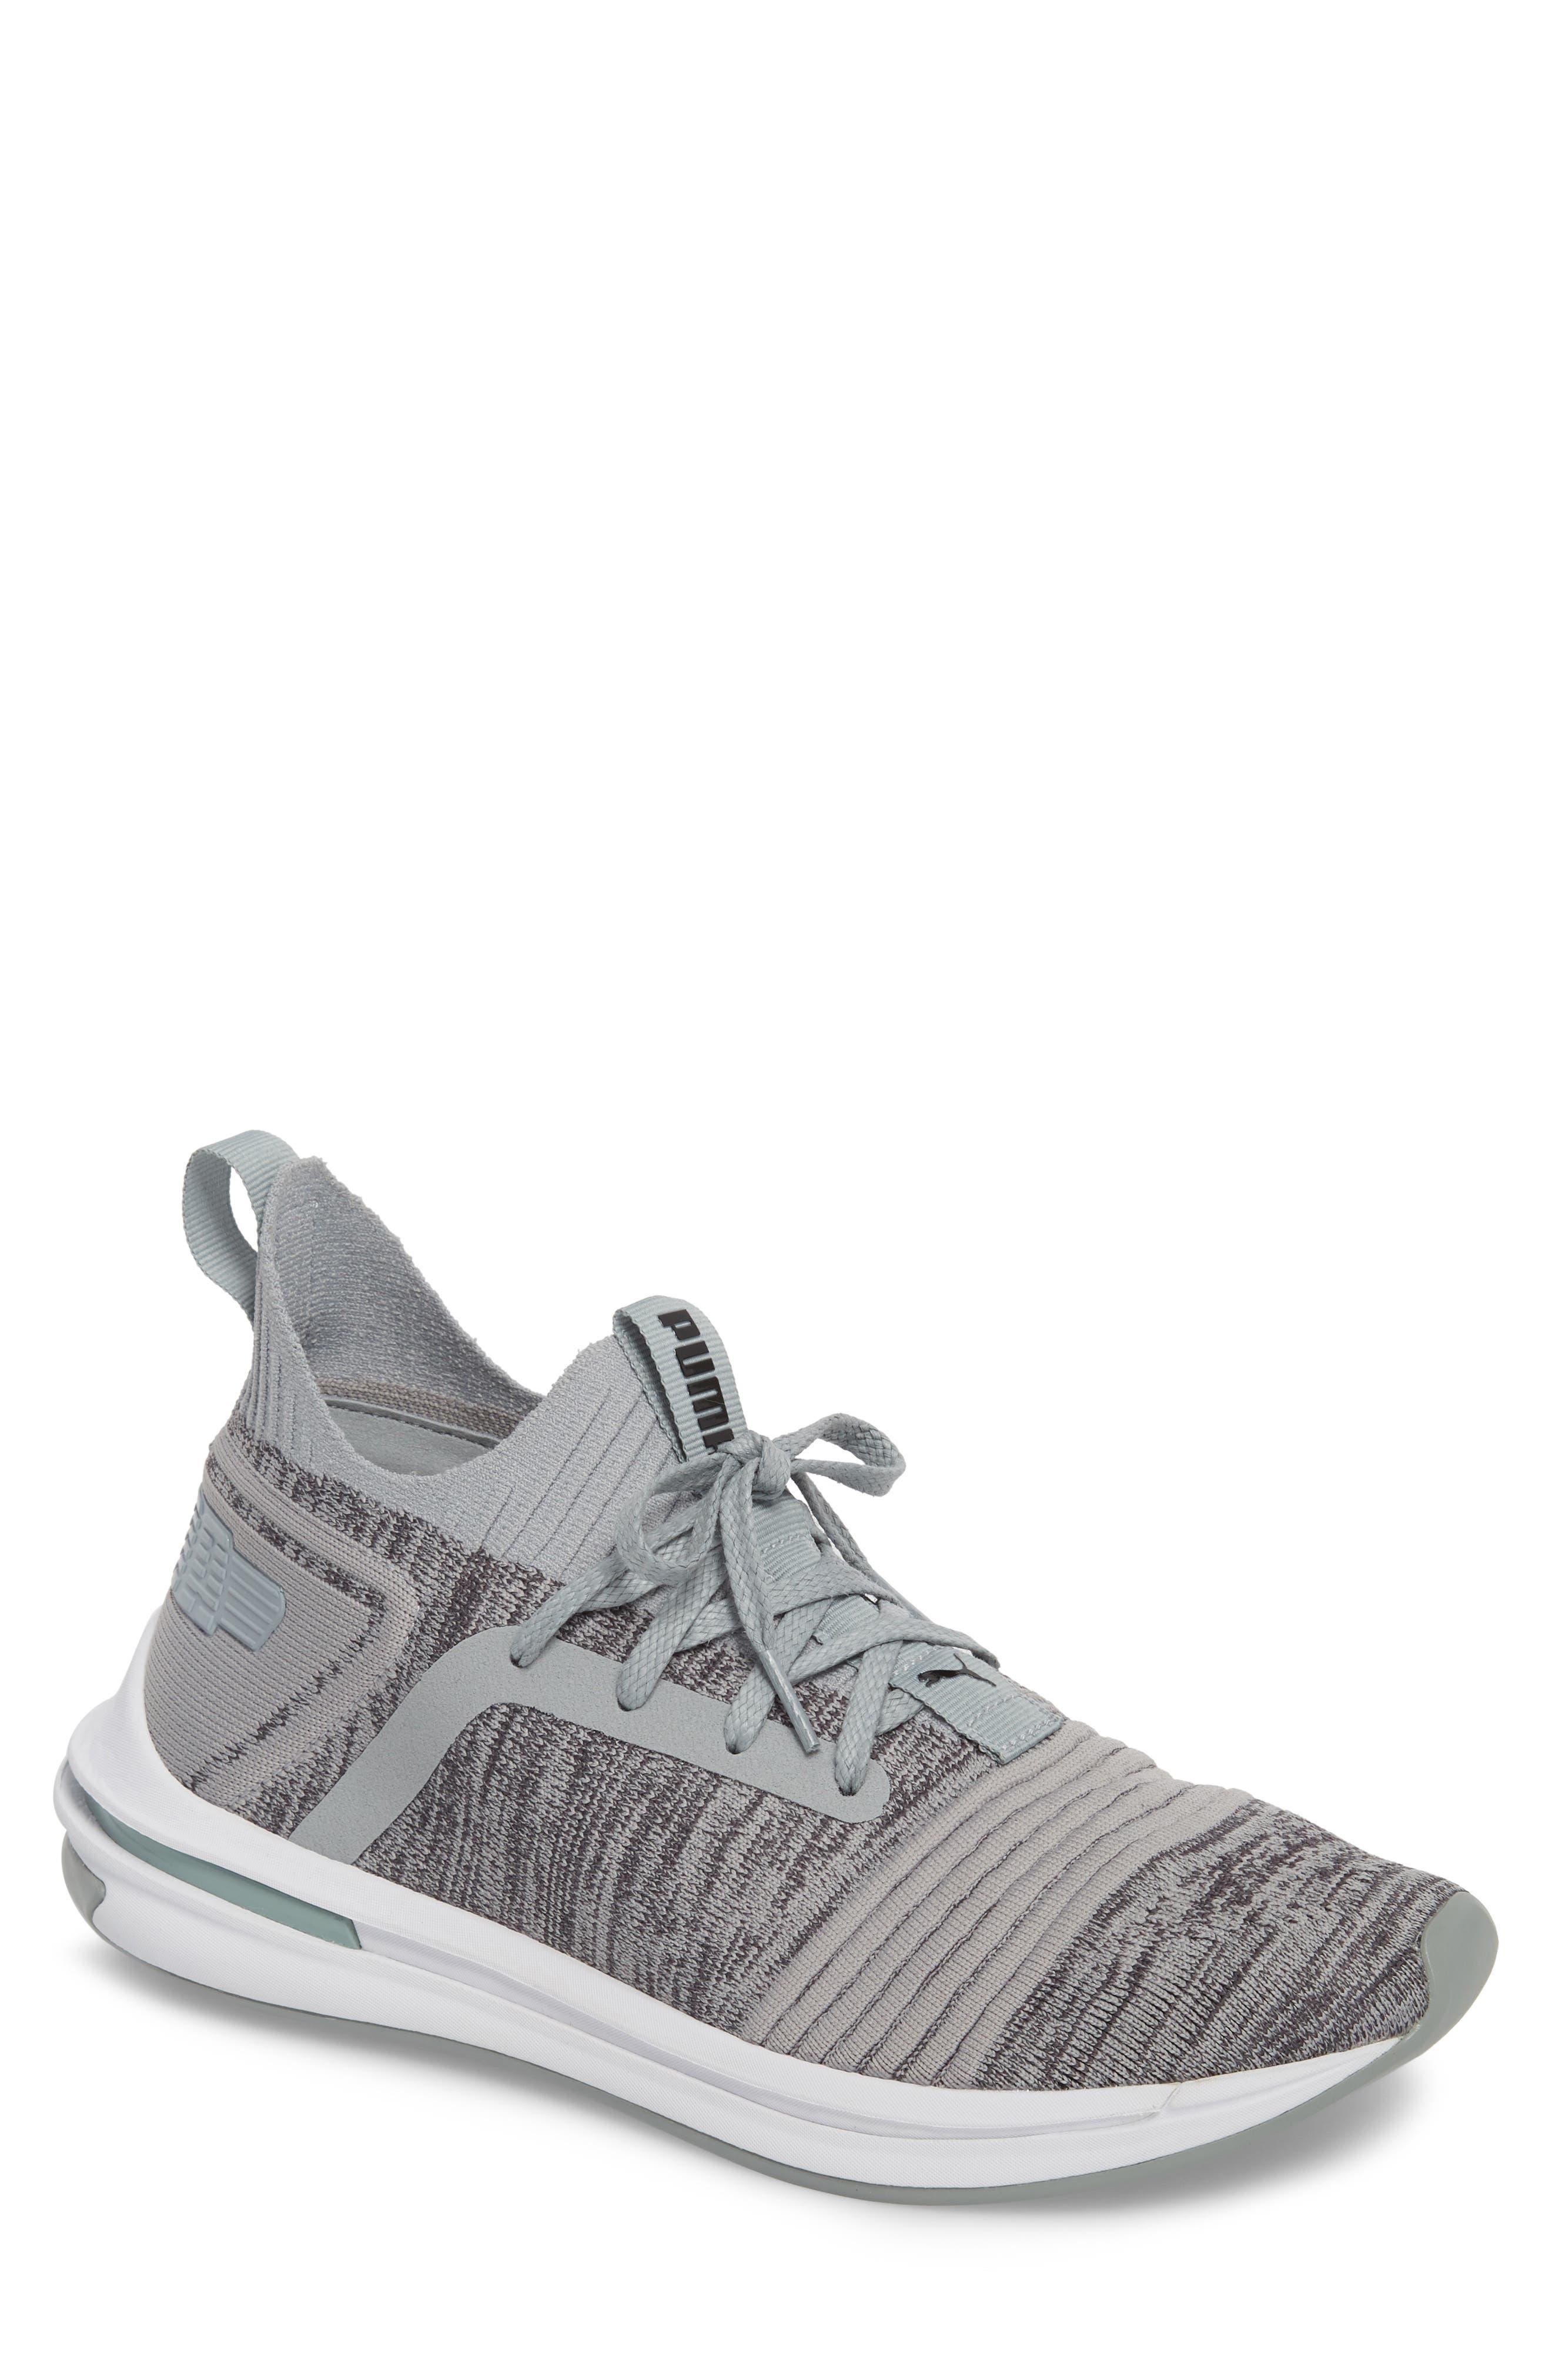 IGNITE Limitless SR evoKNIT Sneaker,                             Main thumbnail 1, color,                             Quarry